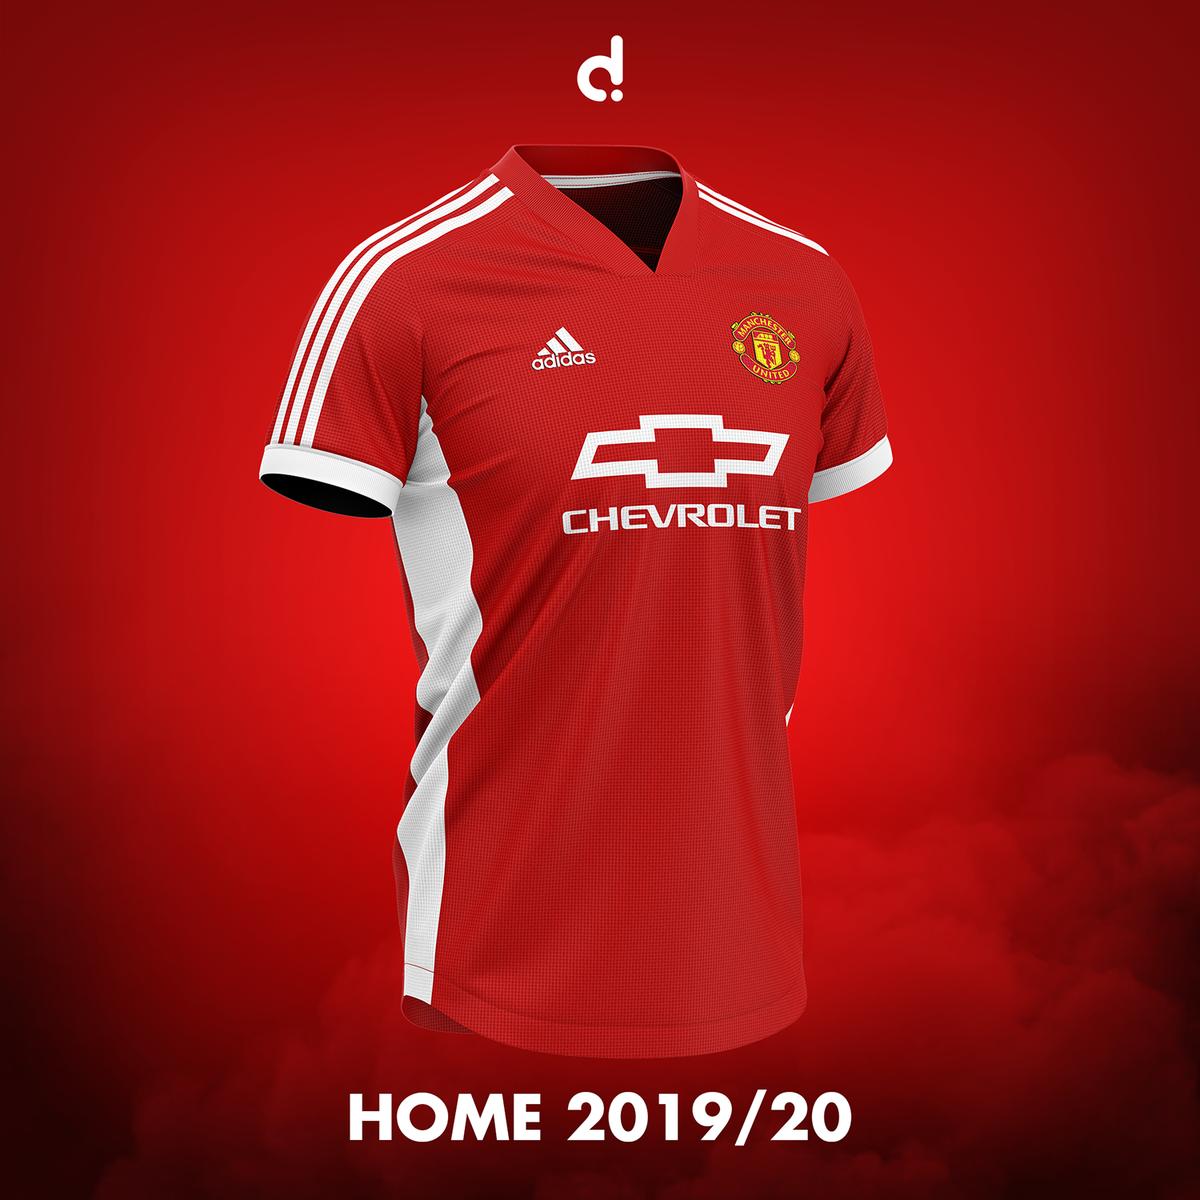 Dom On Twitter Home Kit For The 2019 20 Season Manutd